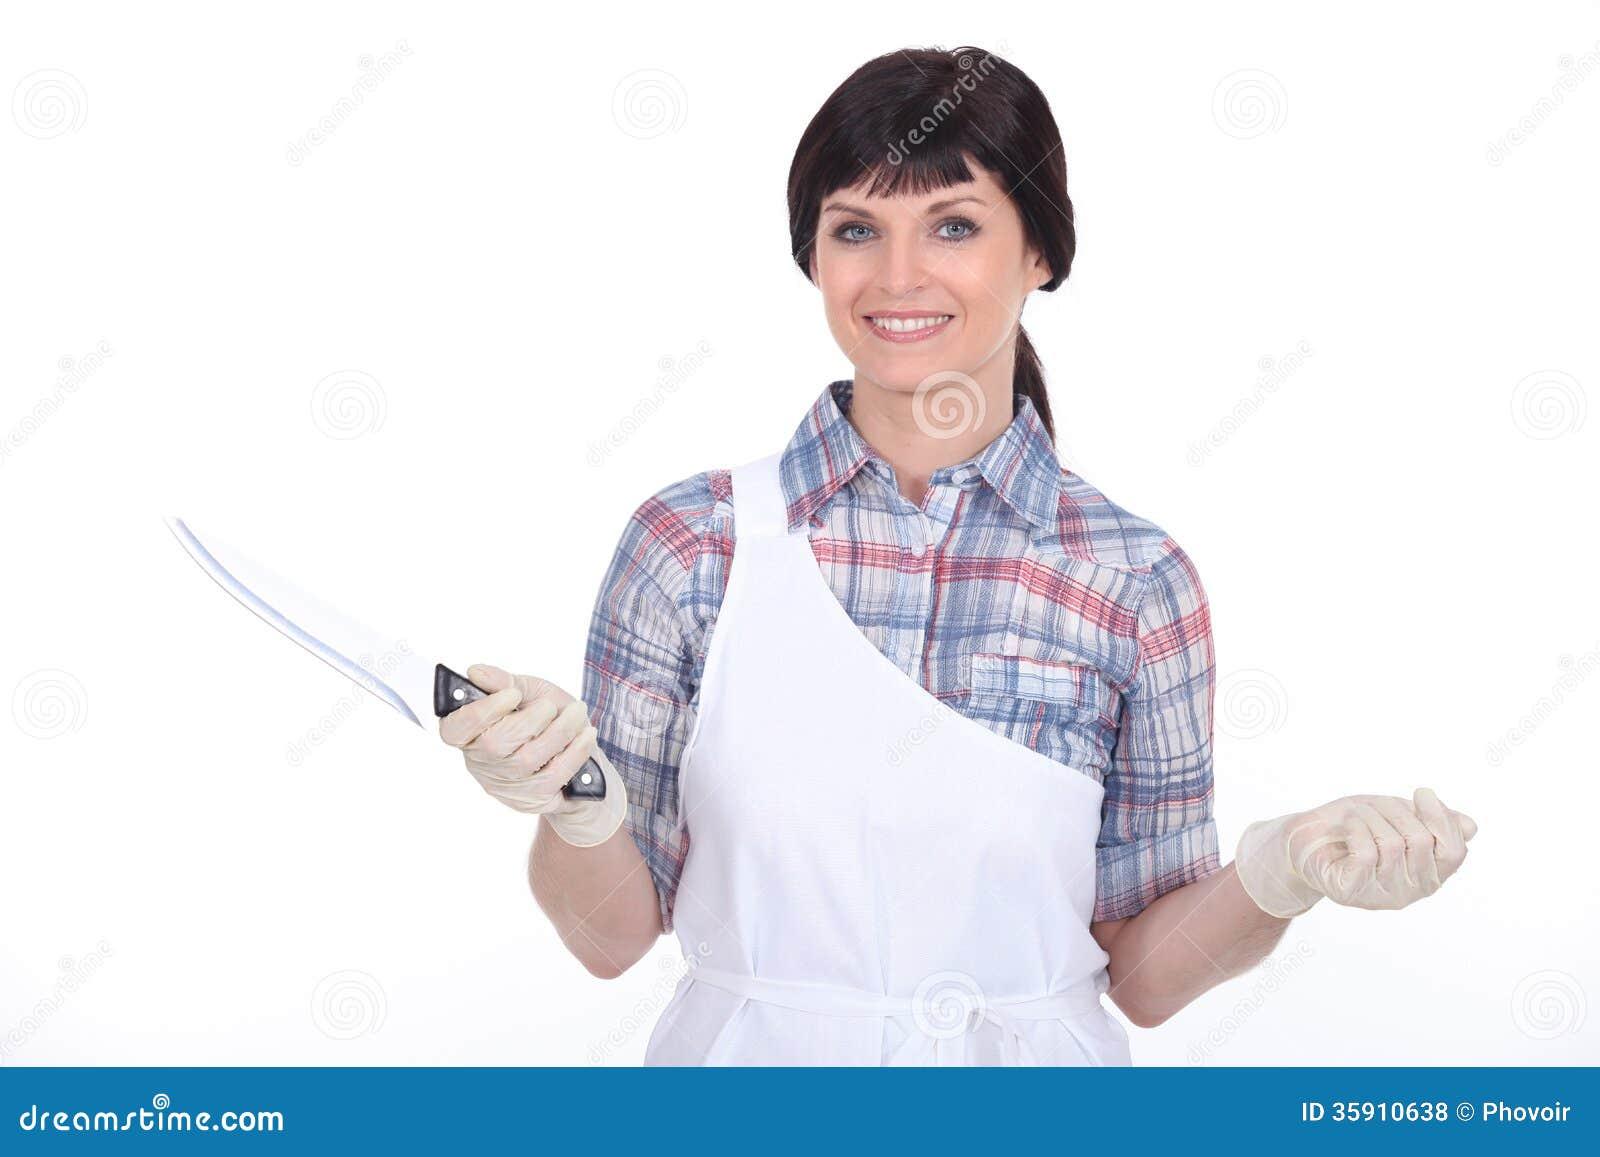 White apron health - Female Butcher